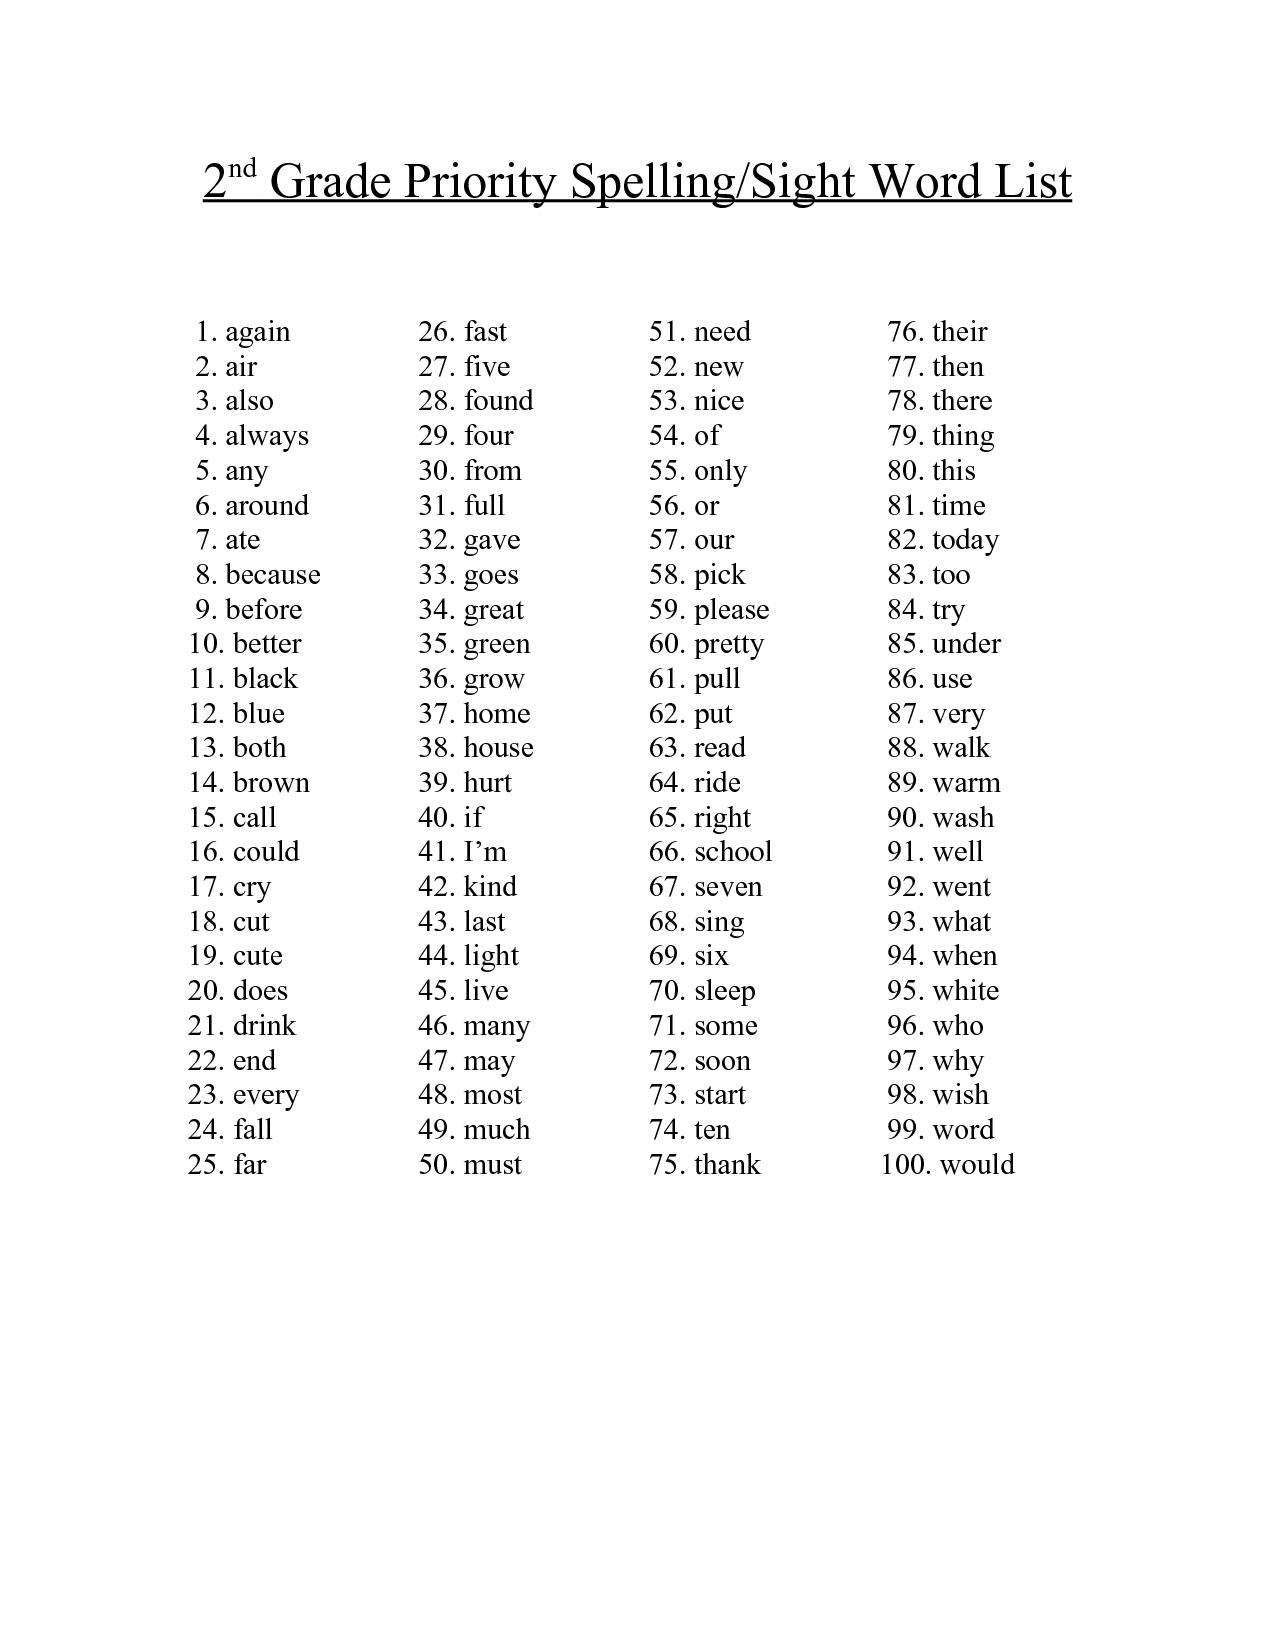 2nd Grade Spelling Words